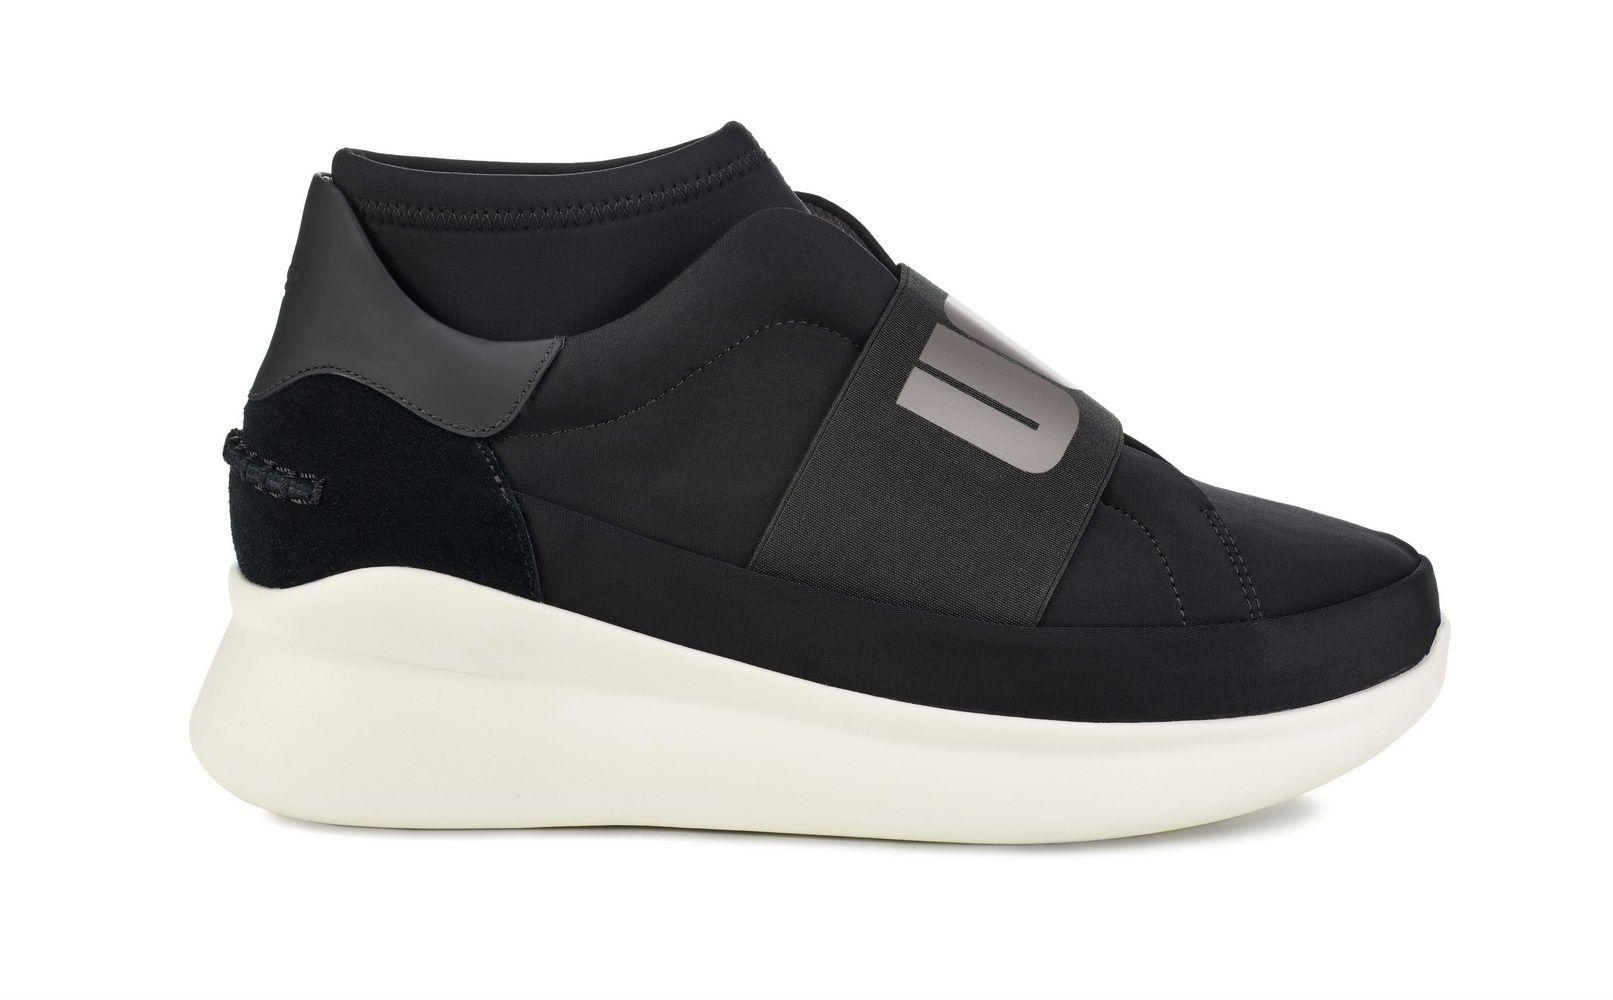 W_Neutra_Sneaker_(1095097-BLK)_(1).PVP.139.00__resize